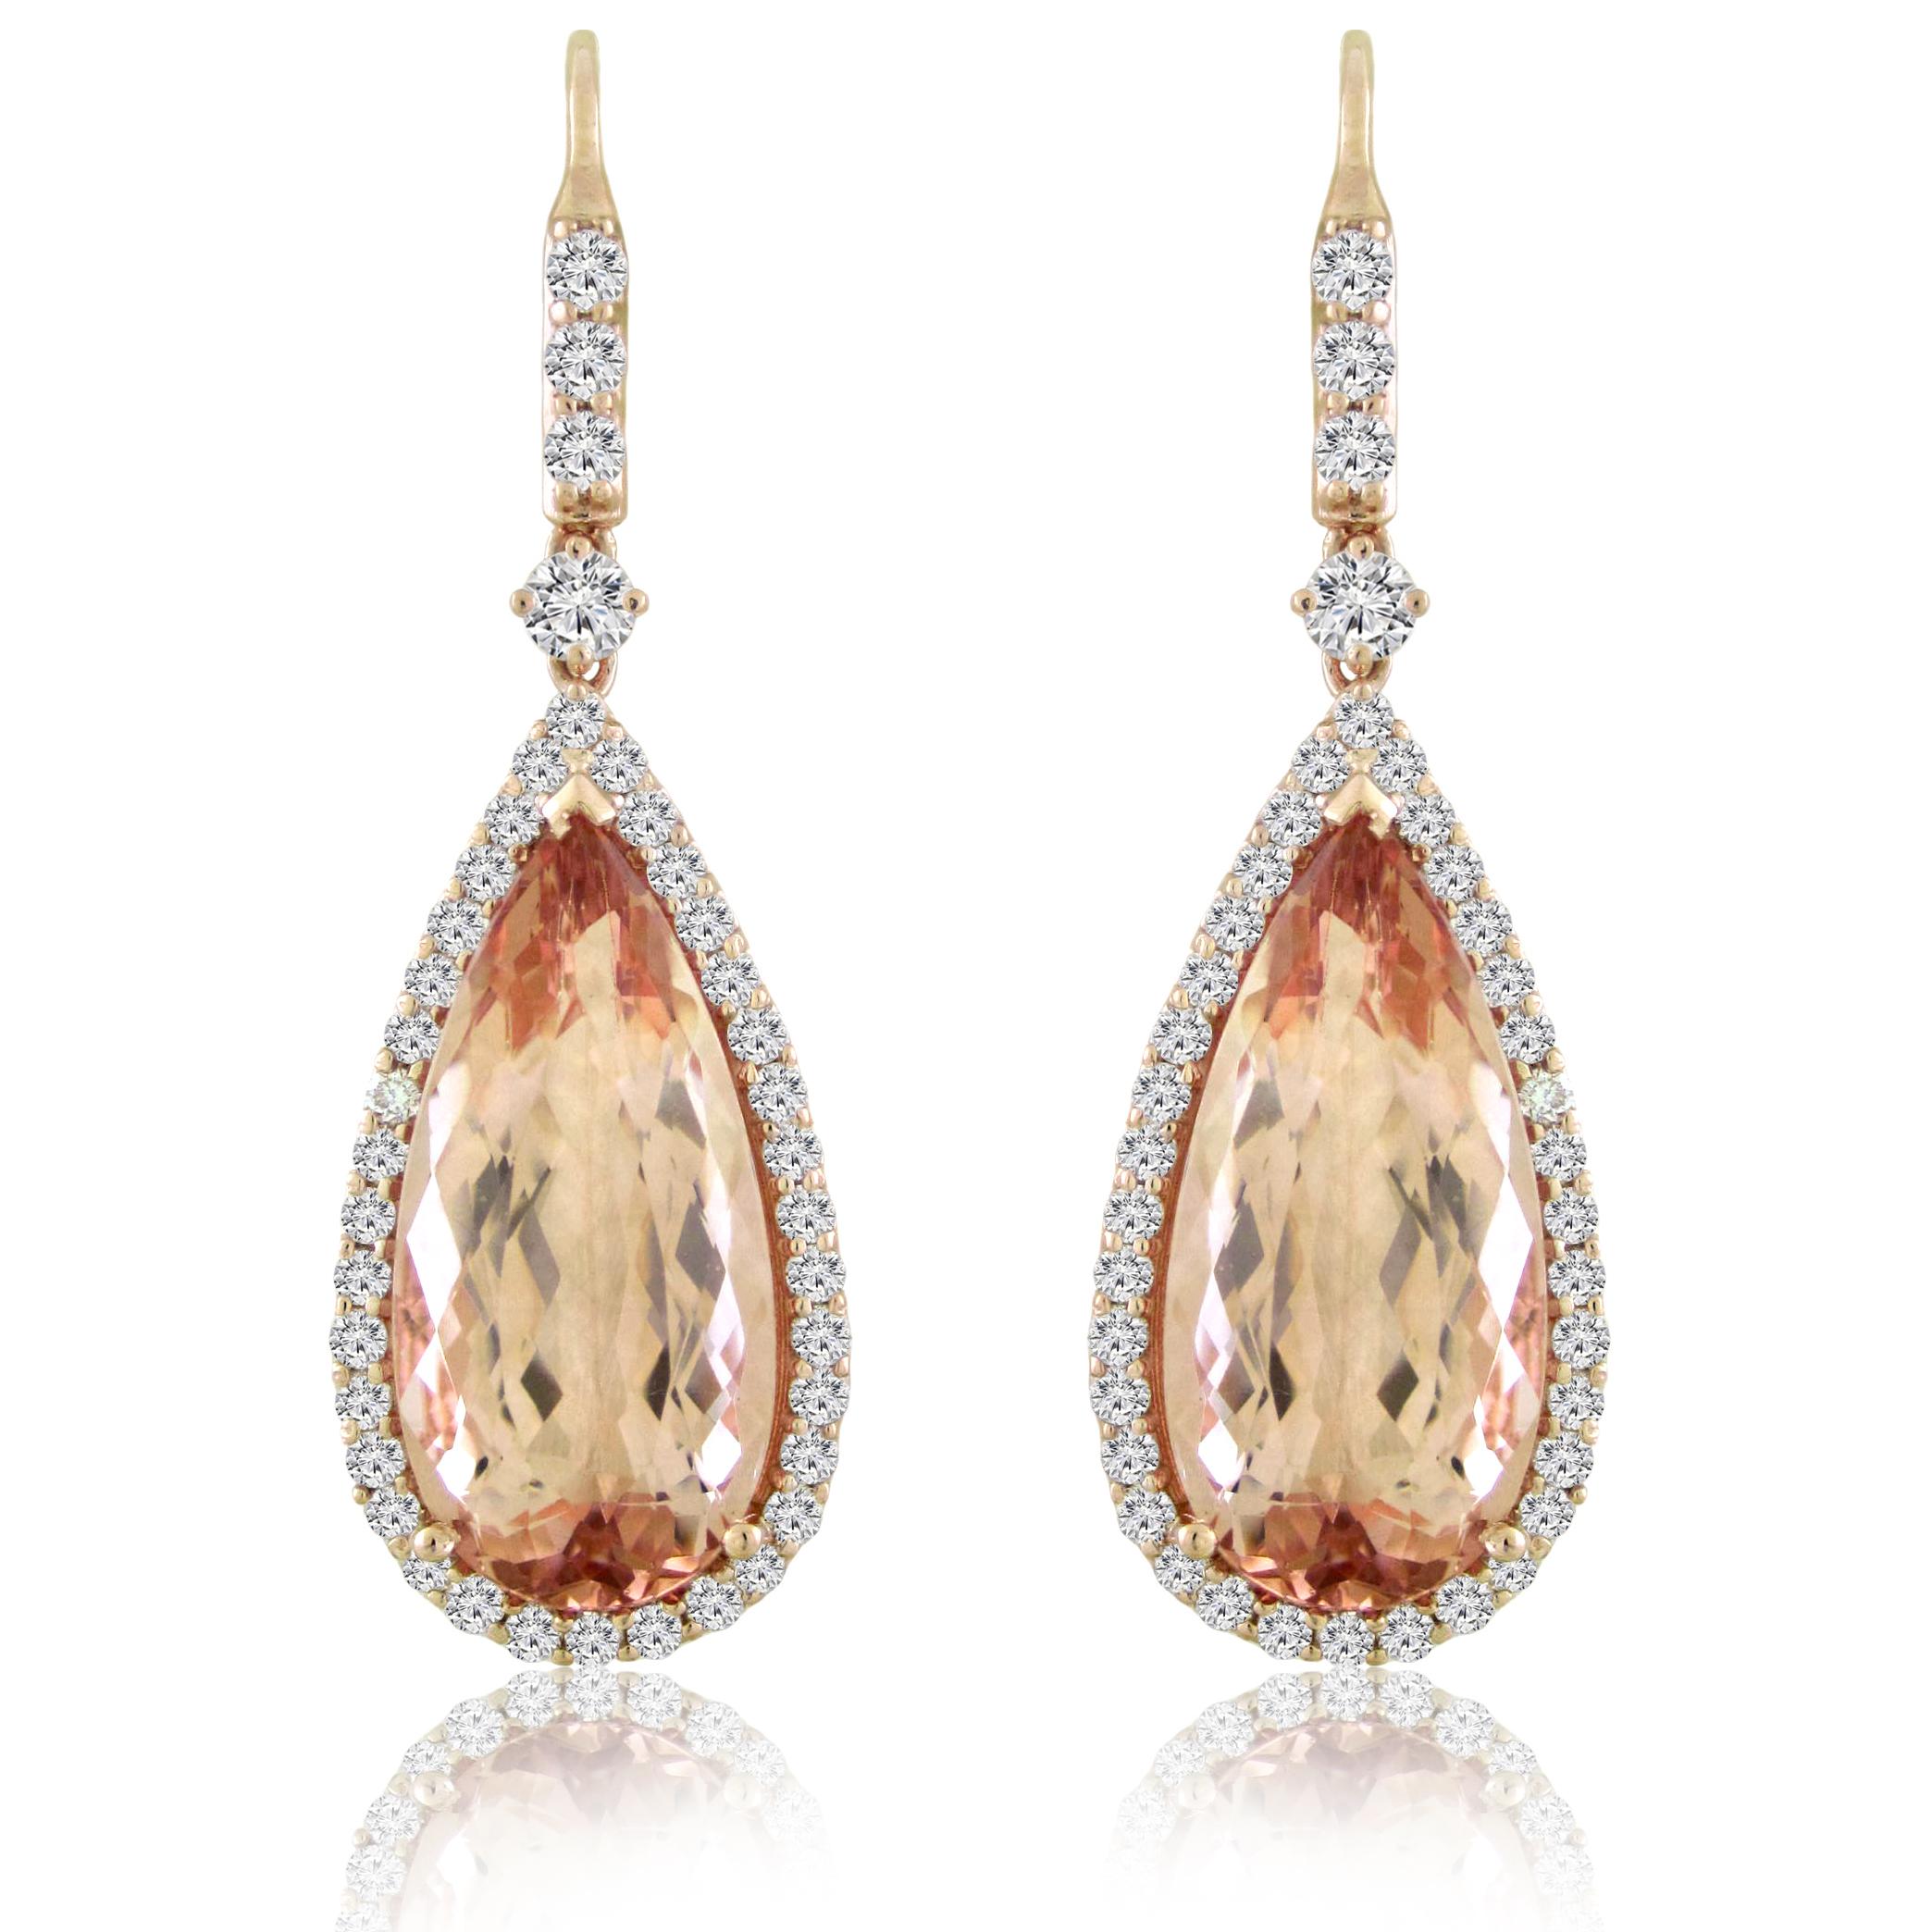 Colorstone Earrings